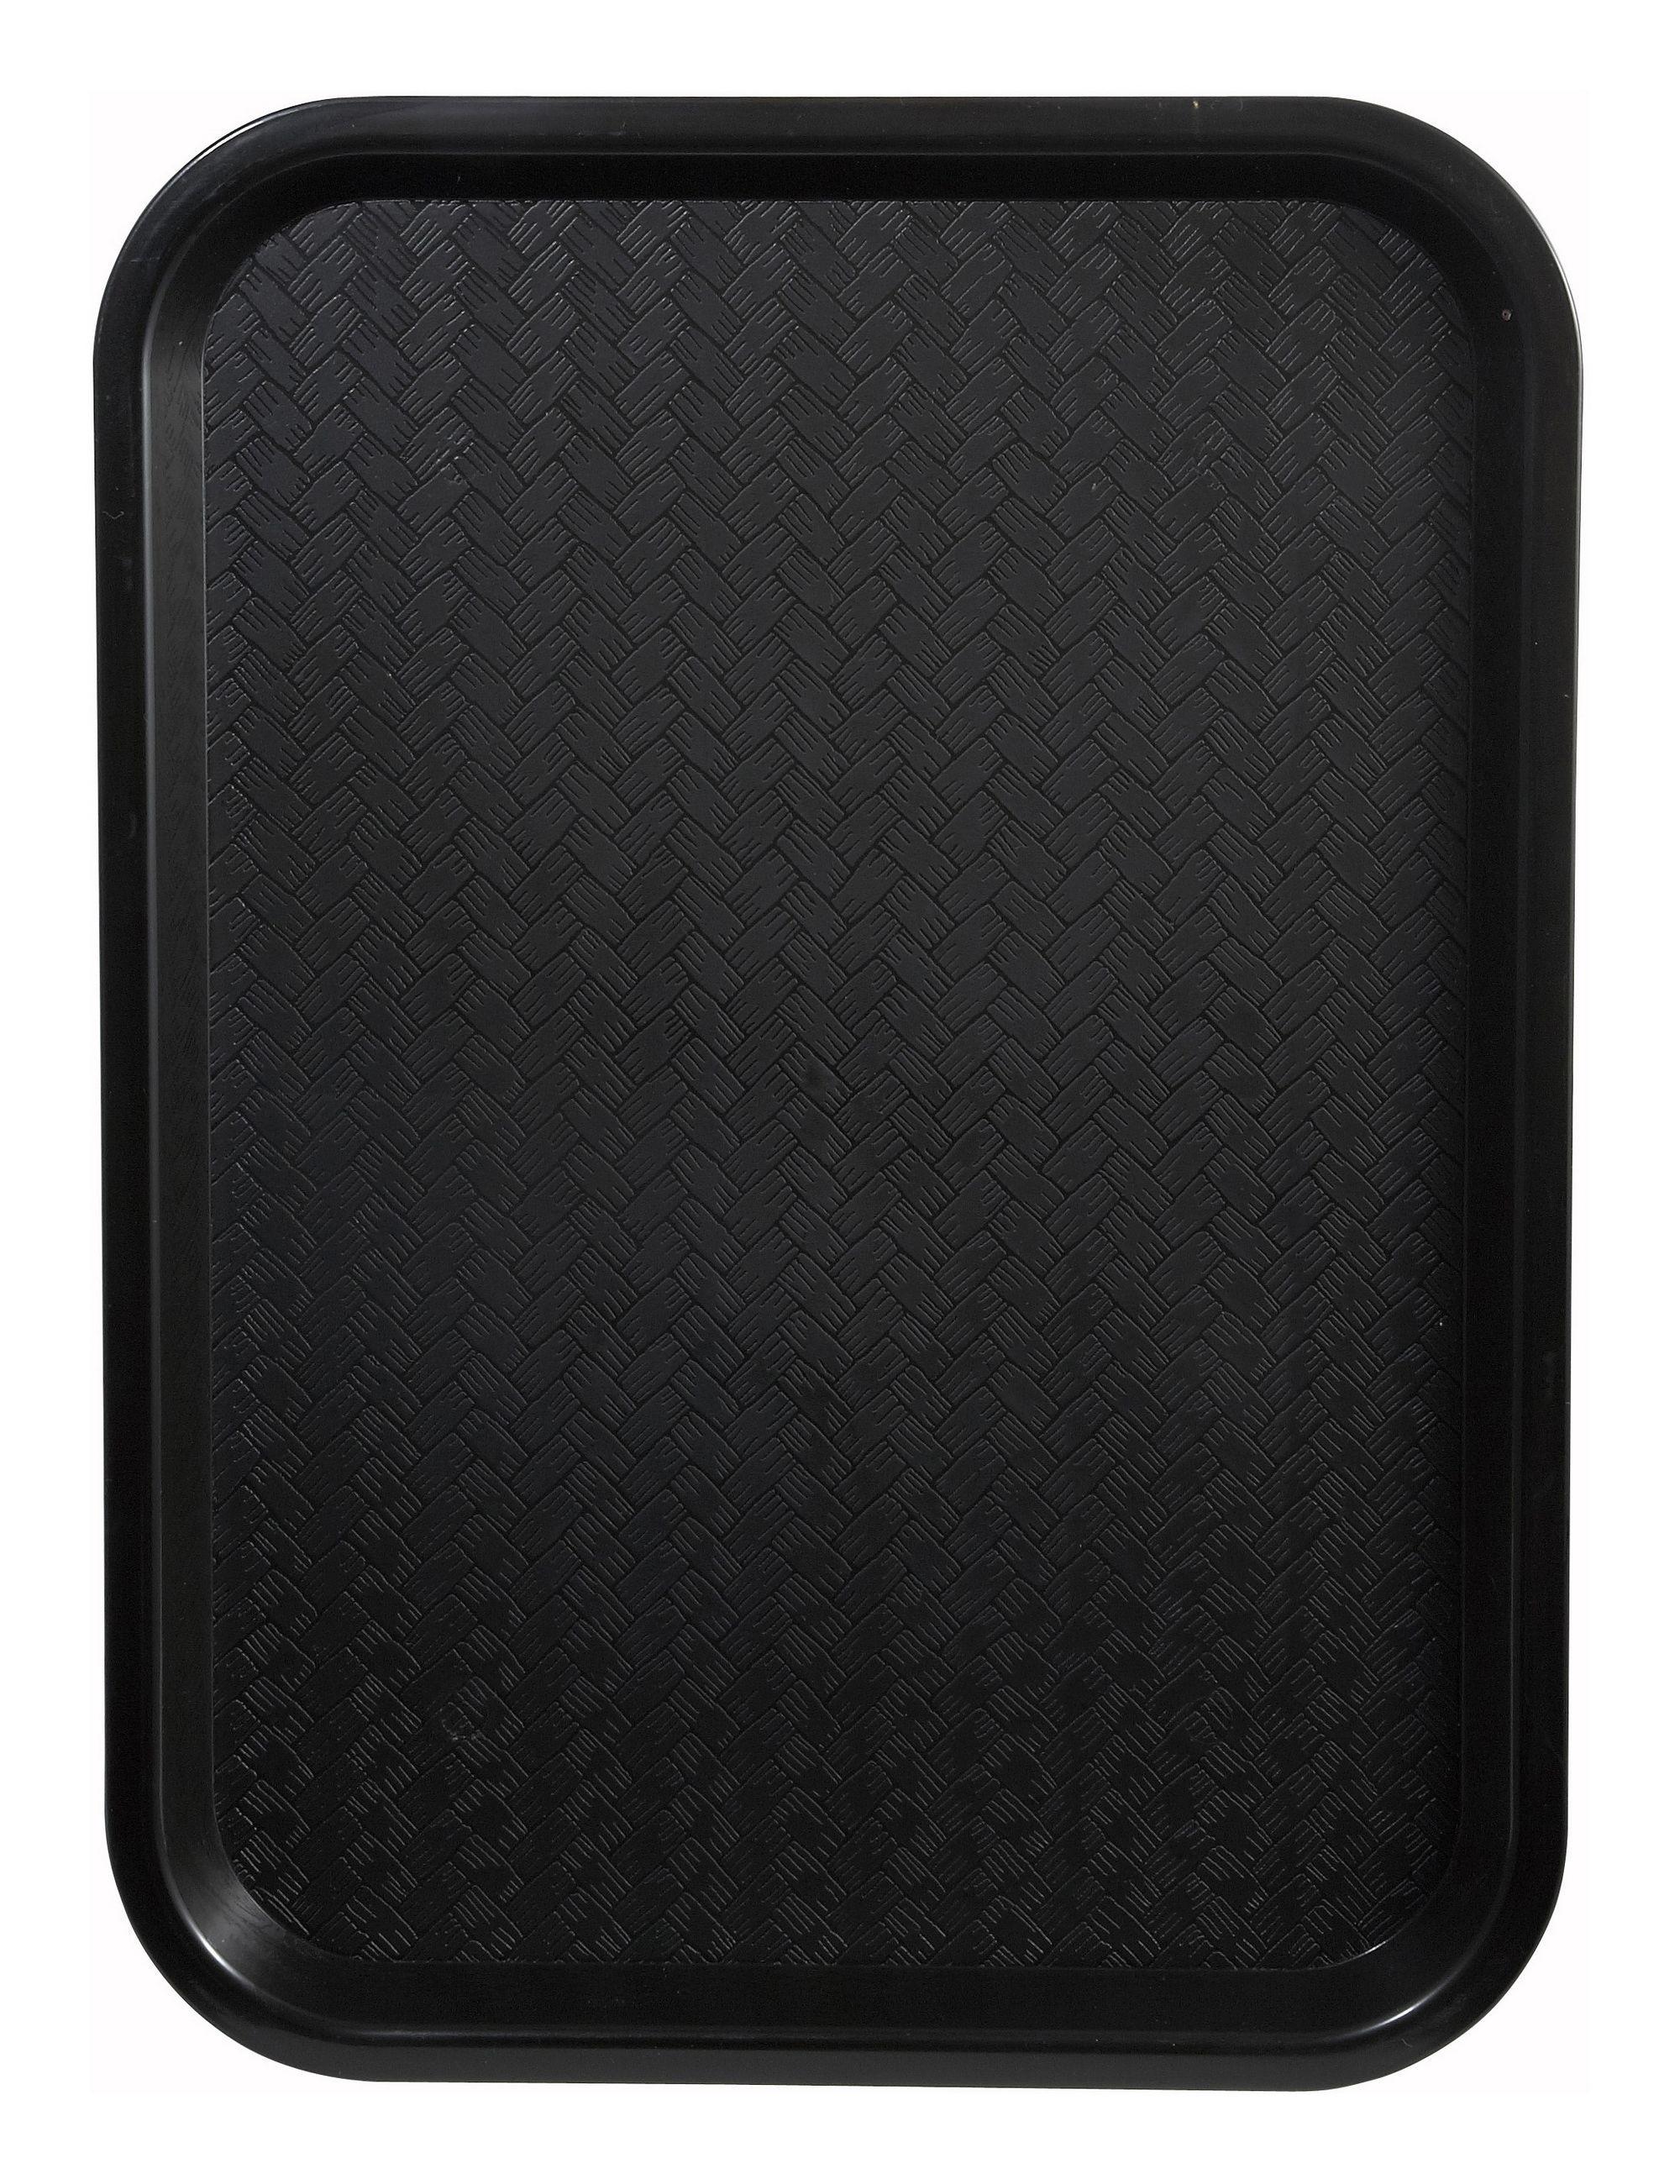 "Winco FFT-1014K Black Plastic Fast Food Tray 10"" x 14"""